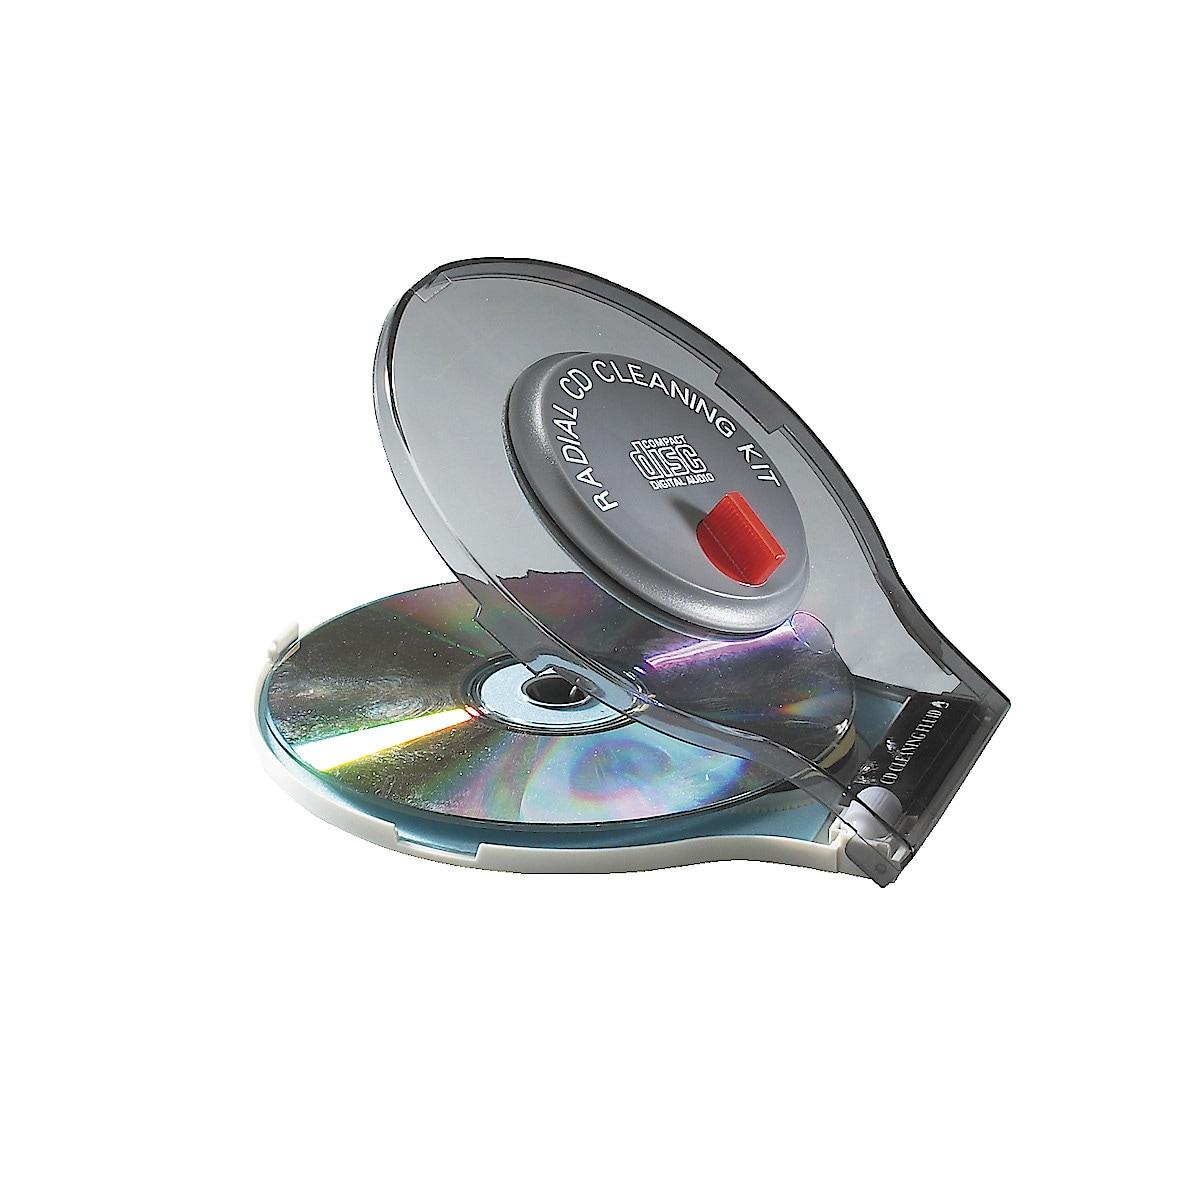 CD/DVD Cleaning Kit